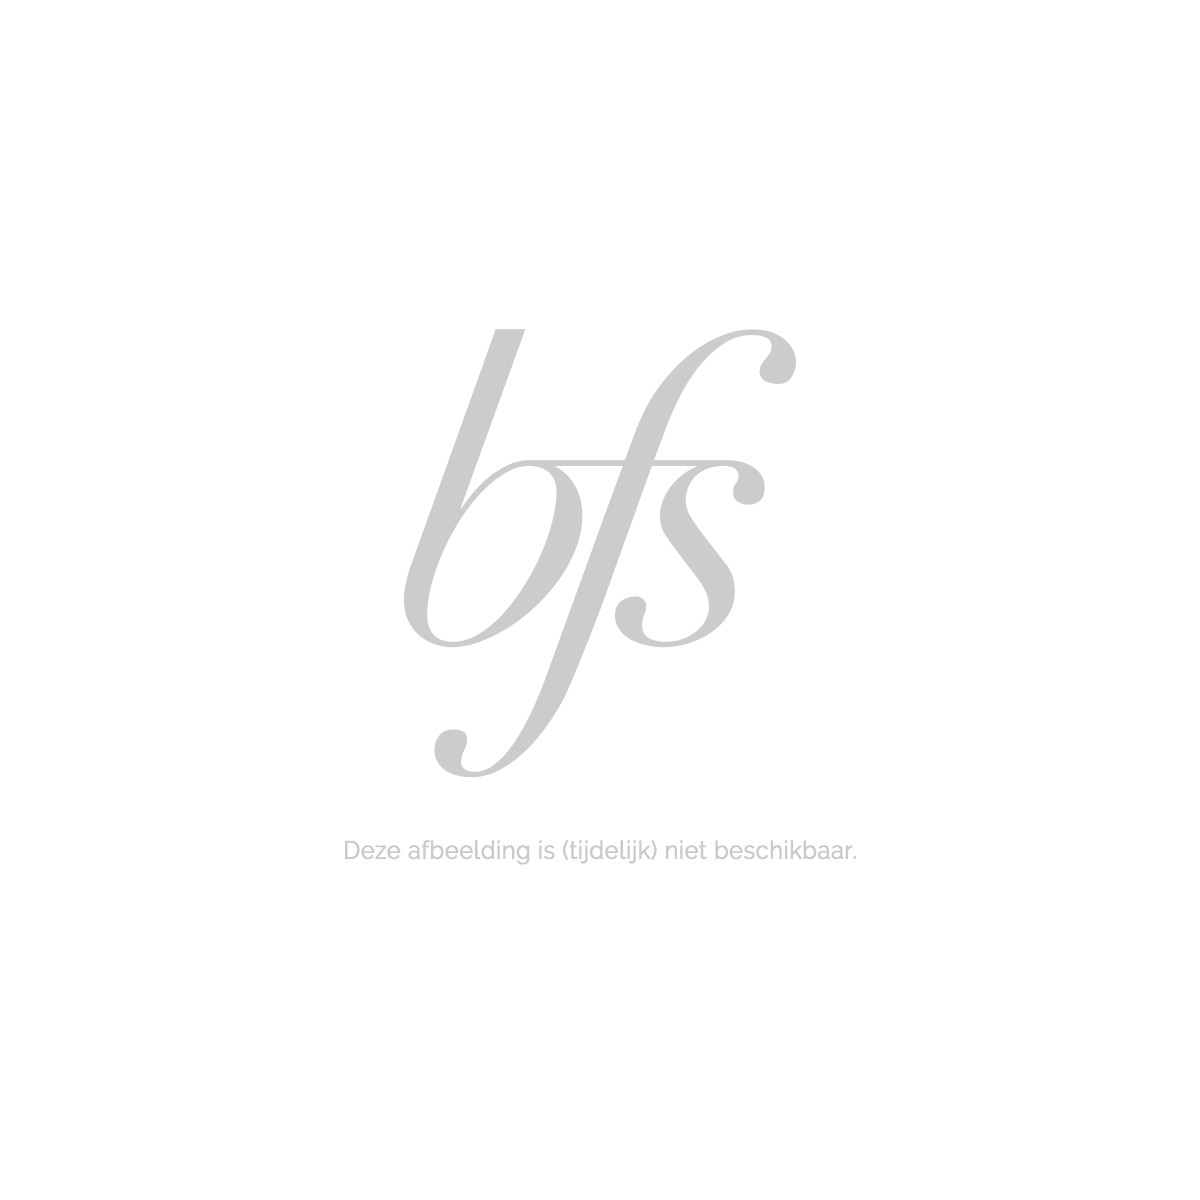 Helena Rubinstein Lash Queen Mascara Feline Blacks 7,20 Ml